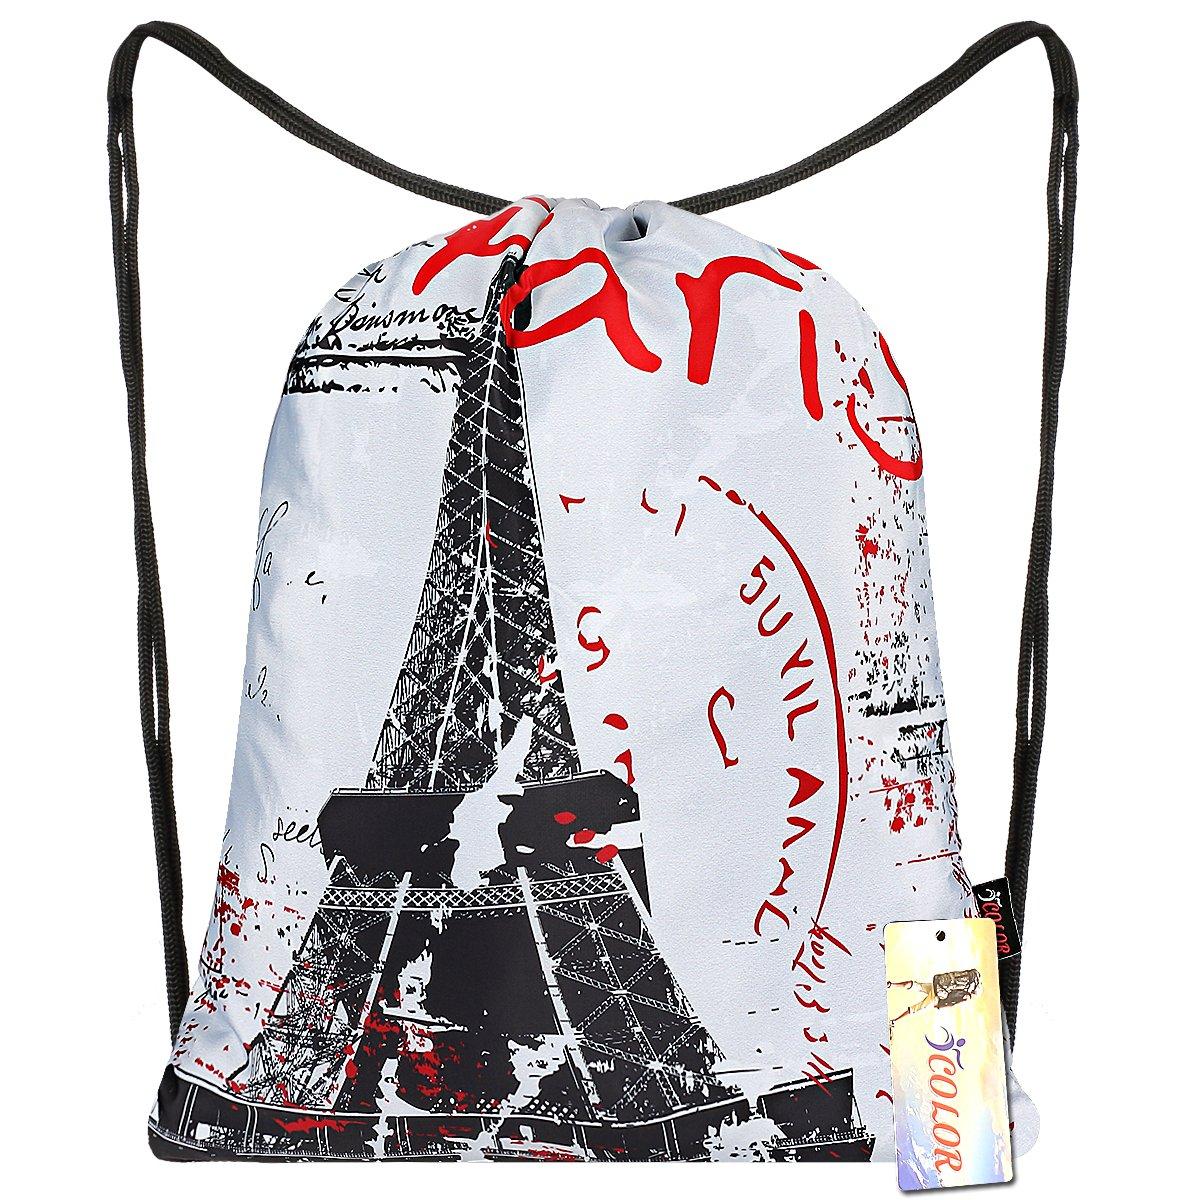 iColor Sackpack,Drawstring Backpacks,Stylish Multipurpose Girls Nylon Drawstring Bags Gym Bags,Teen Dance Bag, Lightweight Gym Bag for Women Cycling Hiking,Team Training Gymsack (Paris)